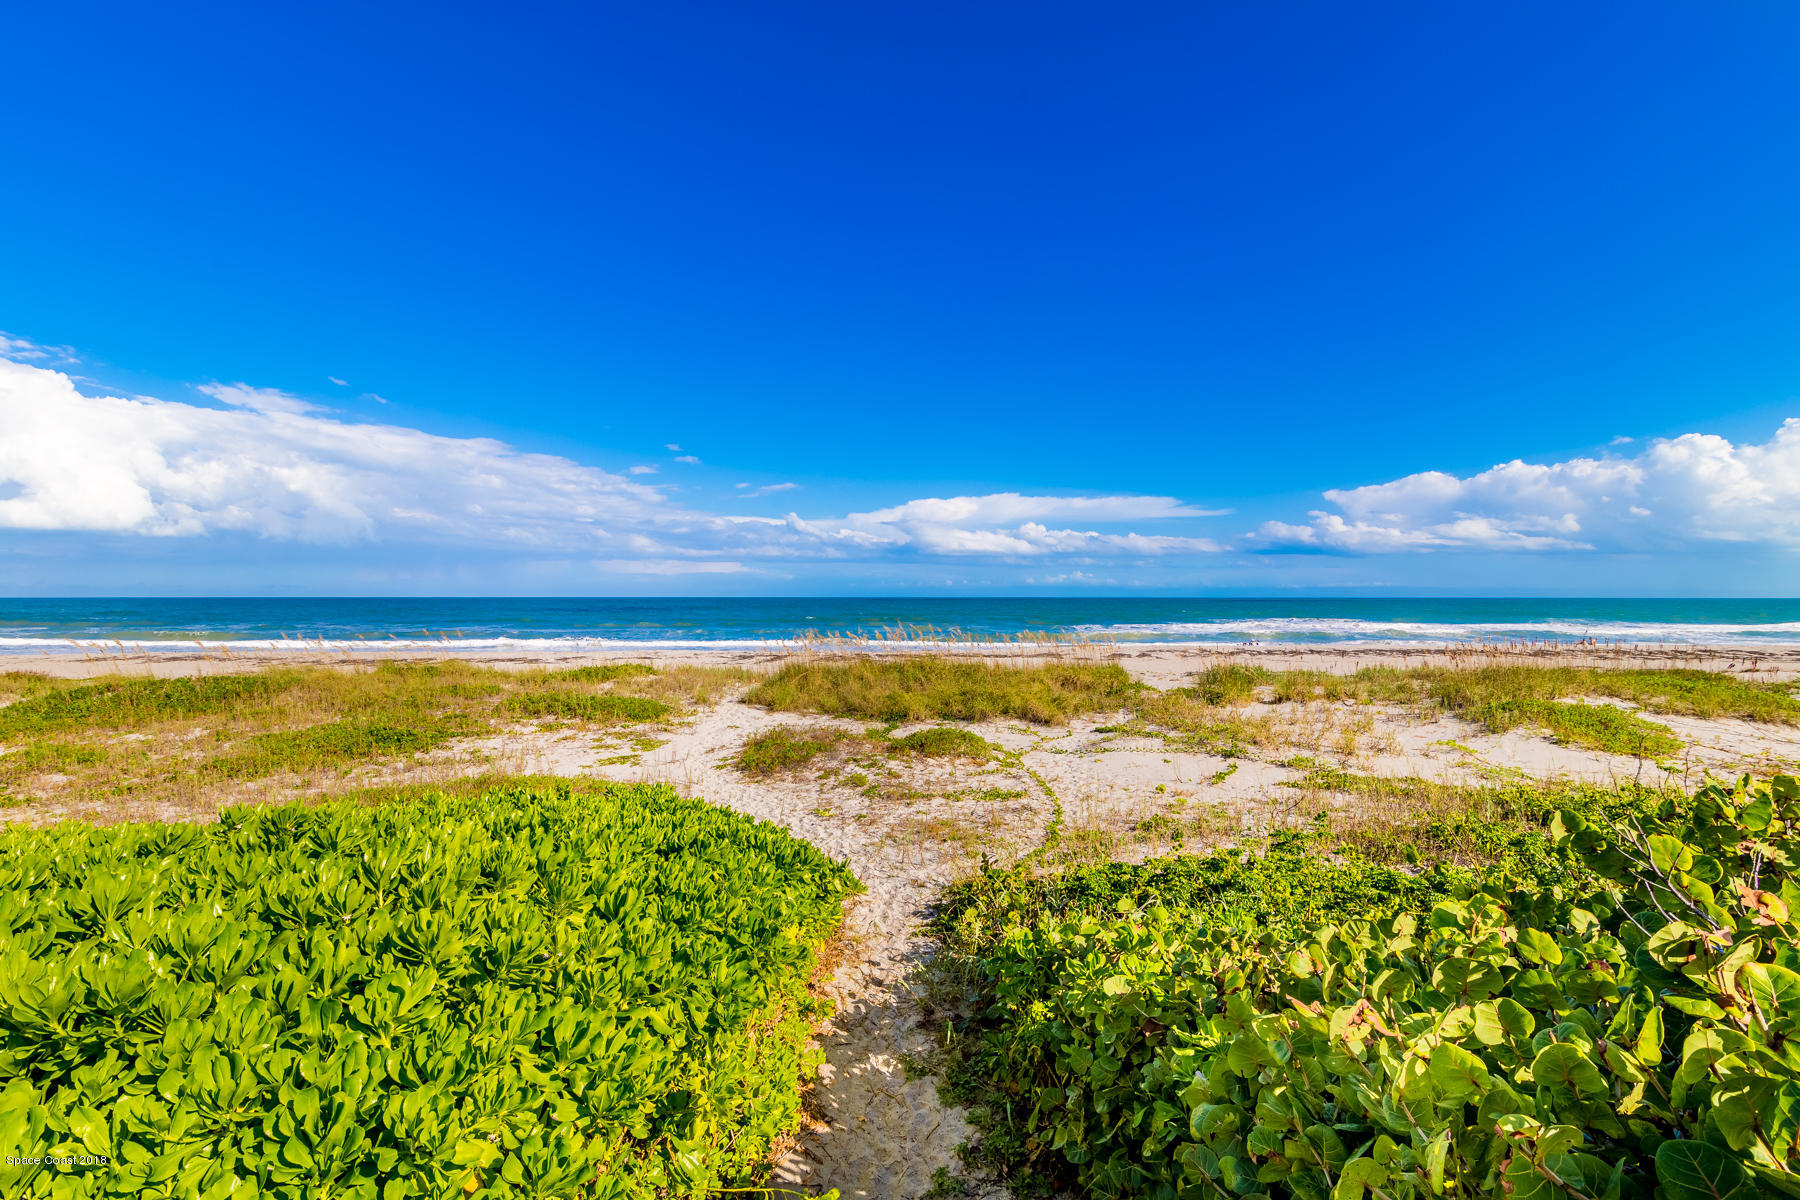 Single Family Home for Sale at 3031 S Atlantic 3031 S Atlantic Cocoa Beach, Florida 32931 United States